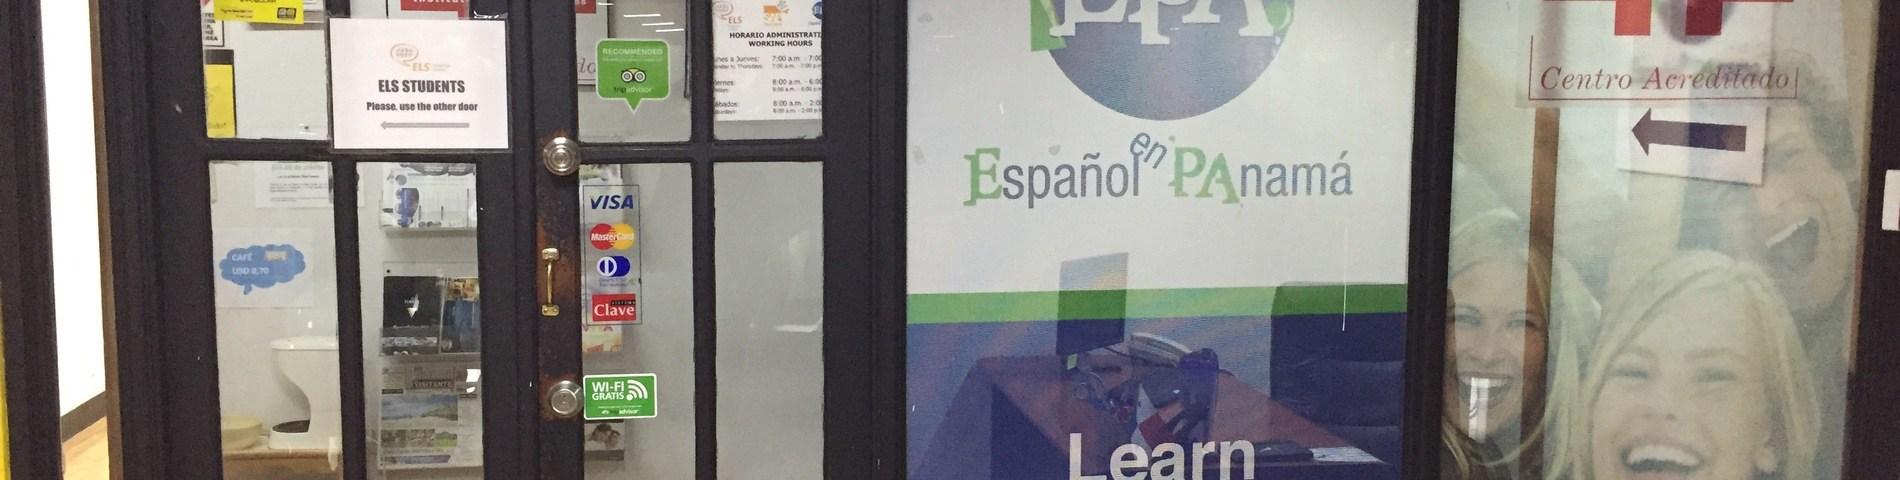 EPA! Español en Panamá billede 1